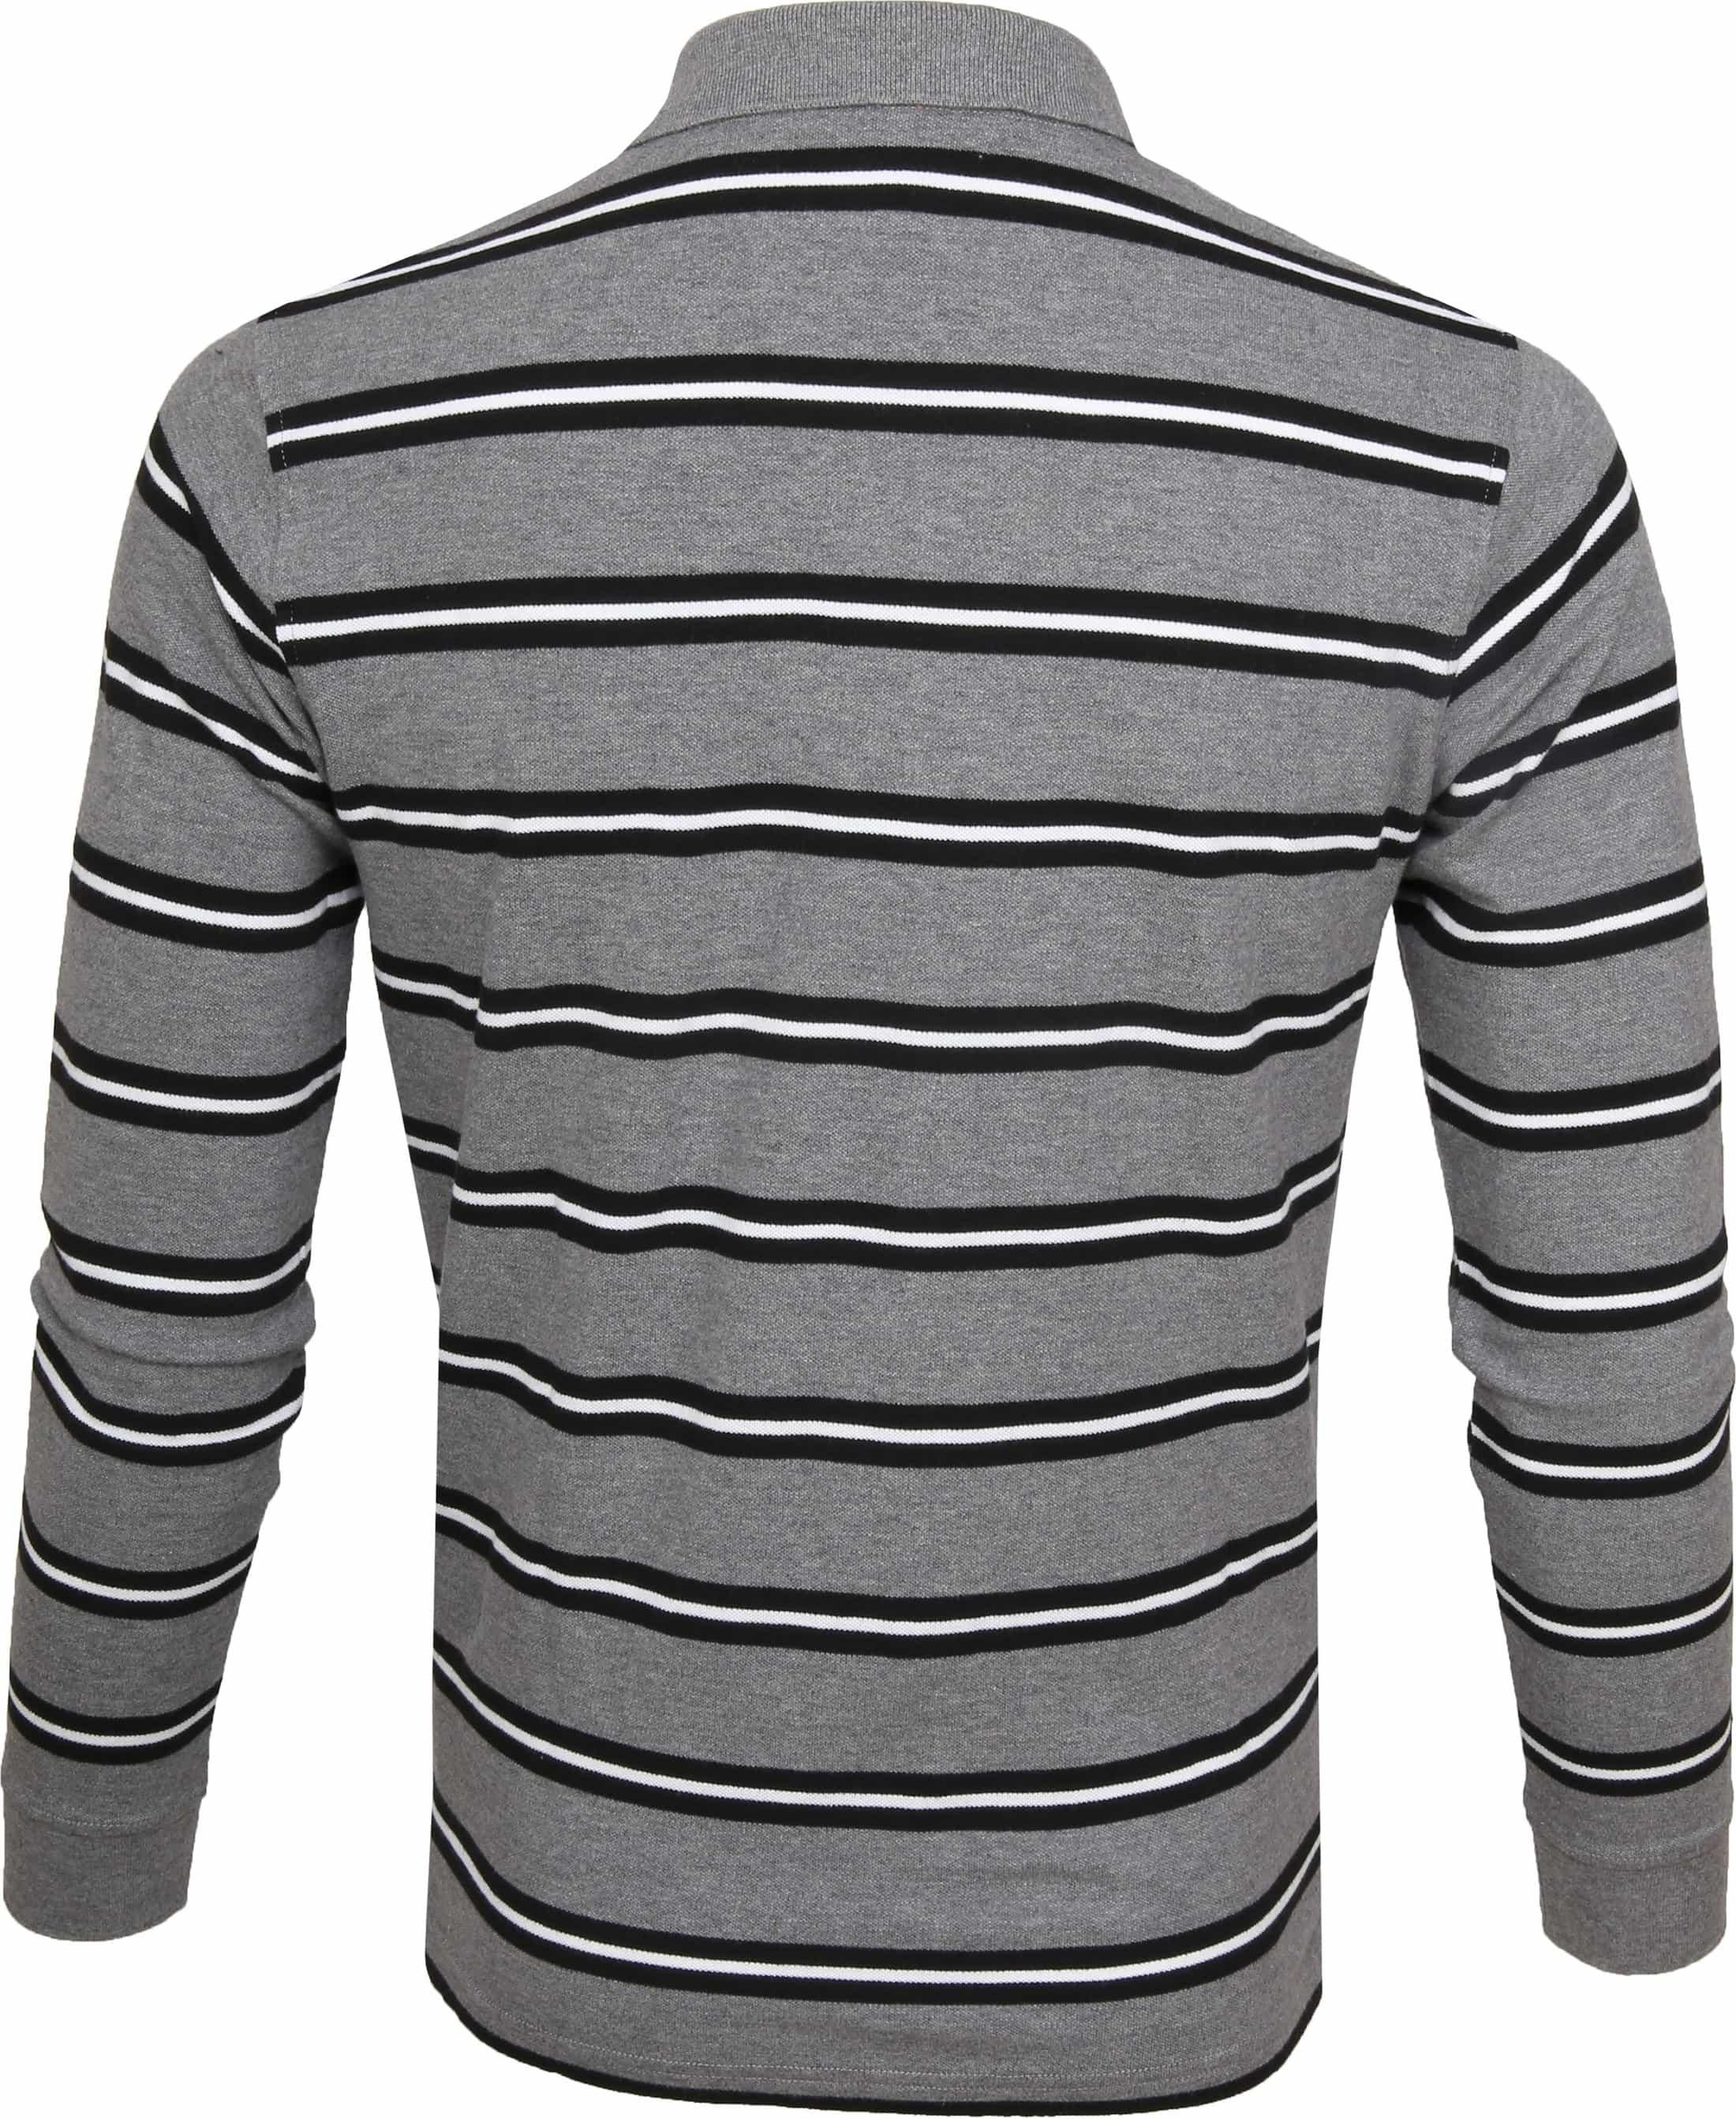 Sun68 Poloshirt LS Stripes Grey foto 3